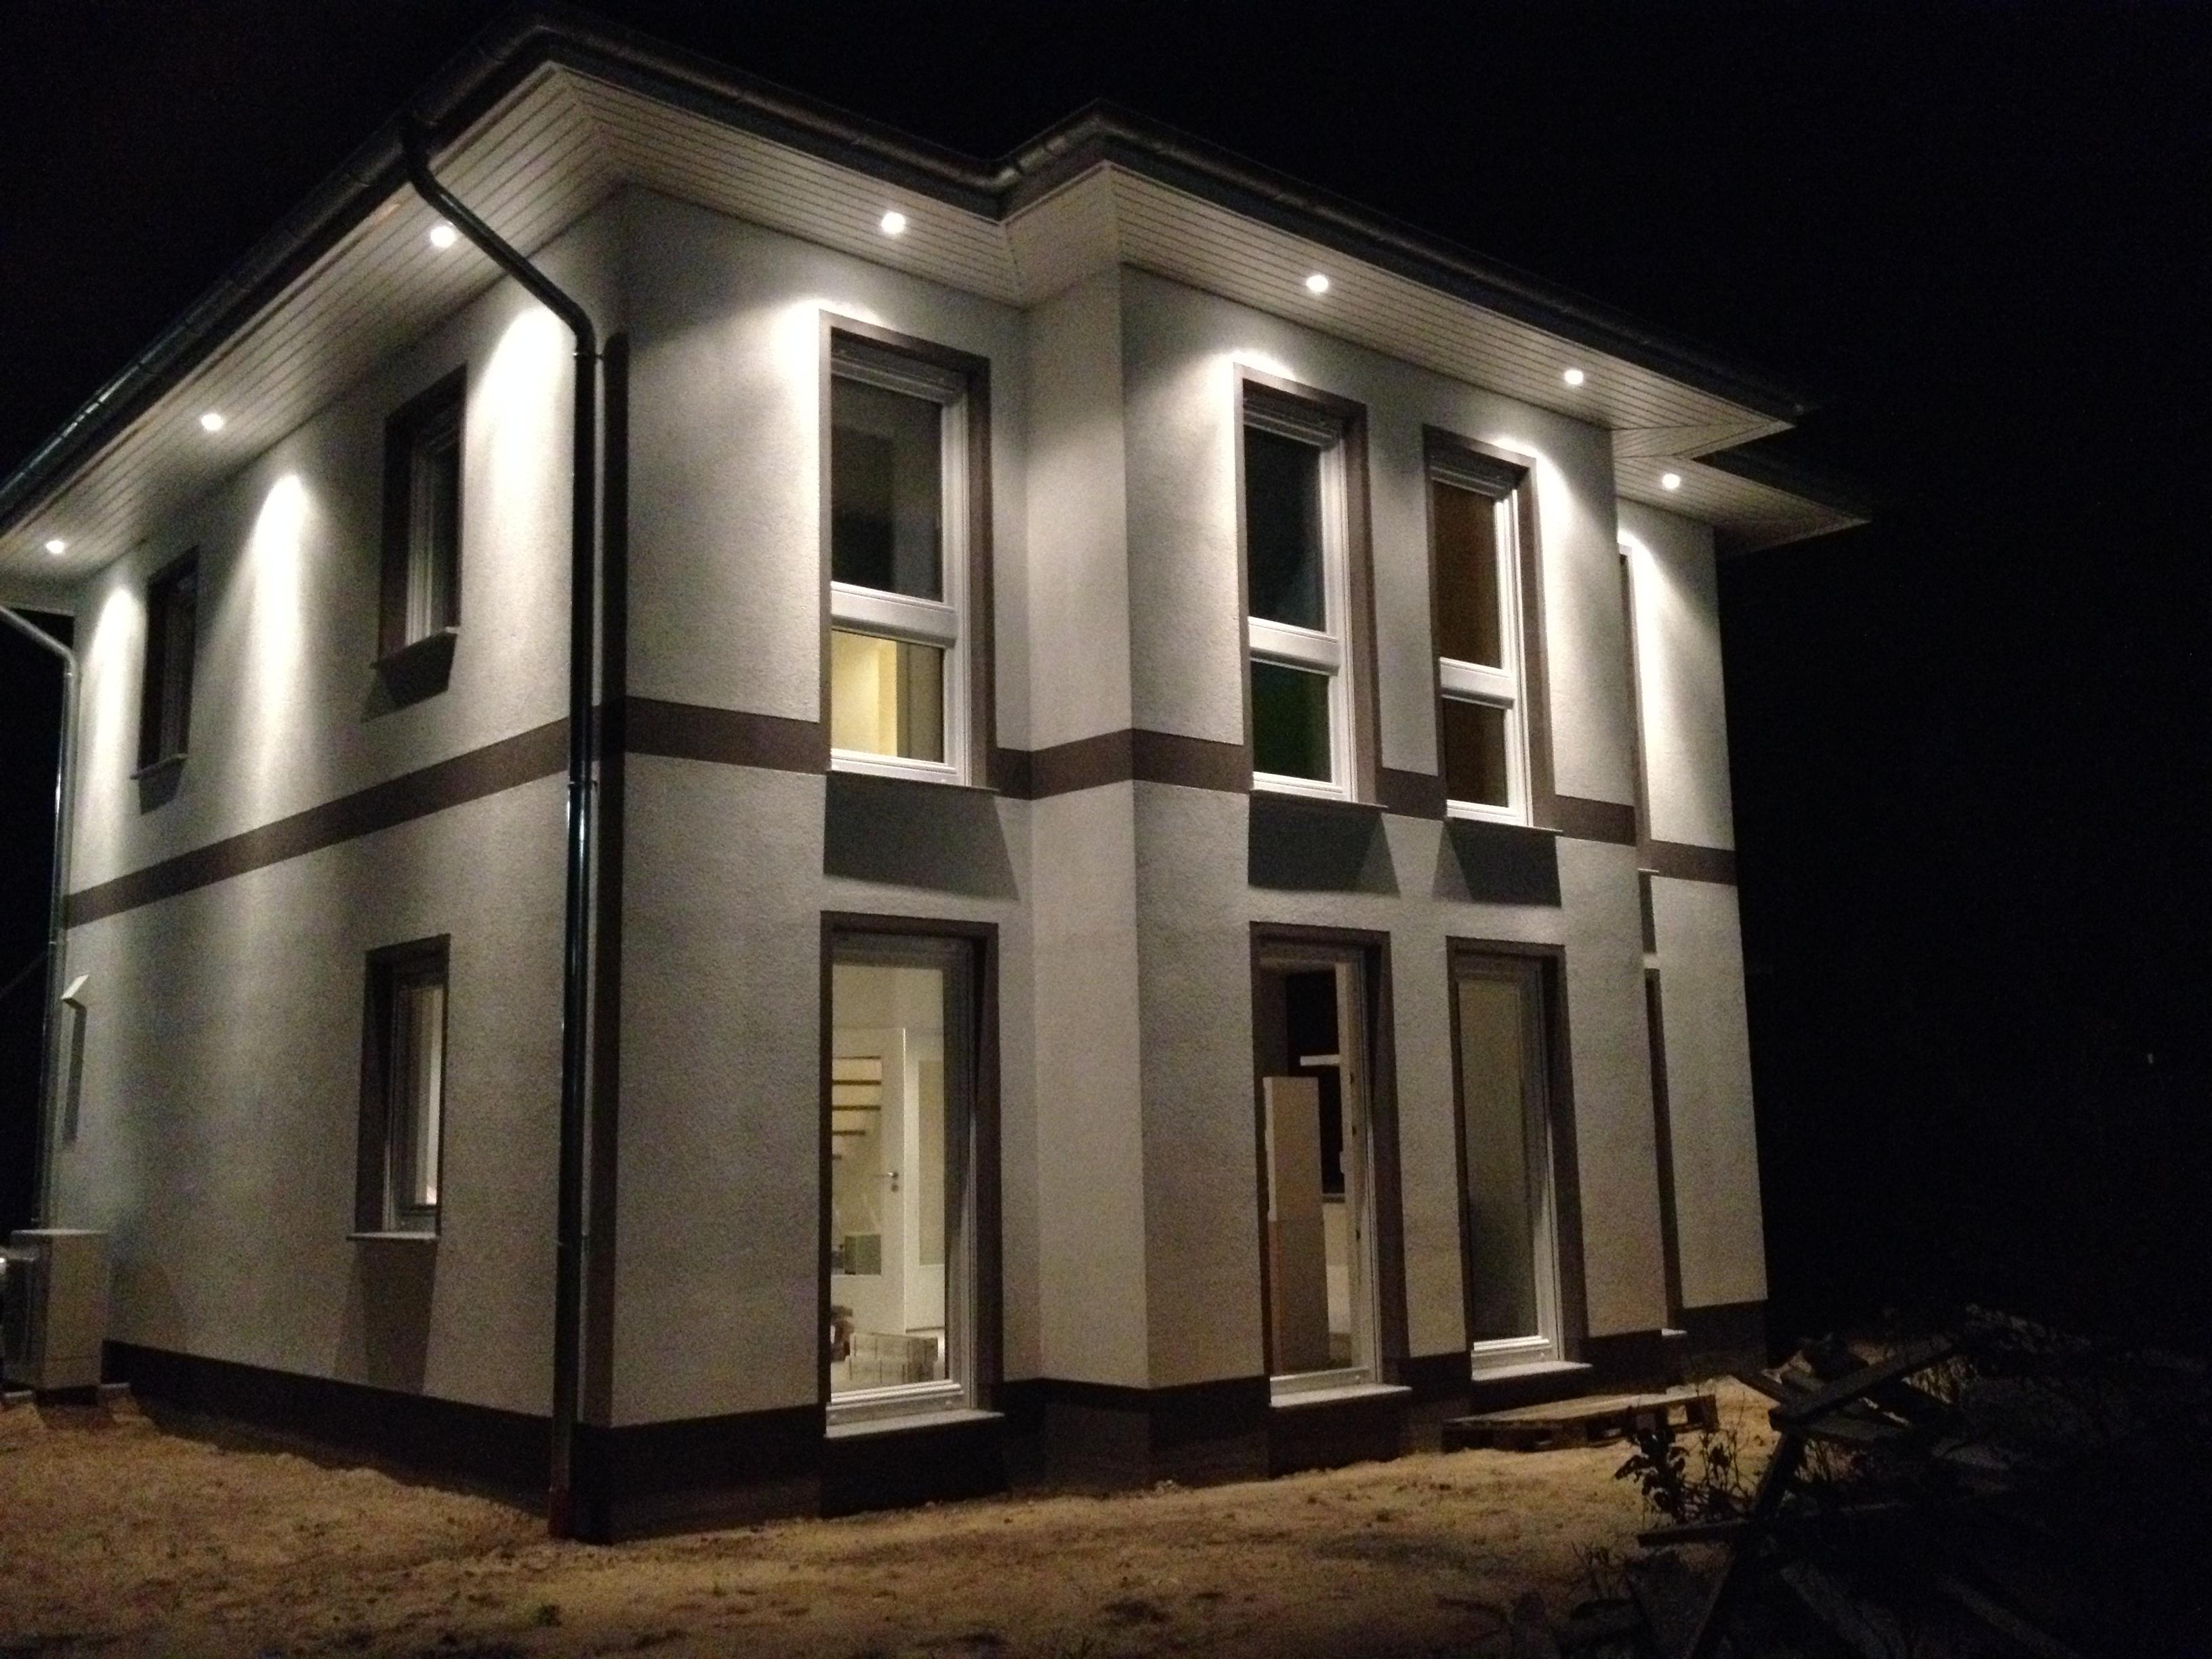 hausbau abgeschlossen unser haus ist fertig baublog stadtvilla apensen. Black Bedroom Furniture Sets. Home Design Ideas